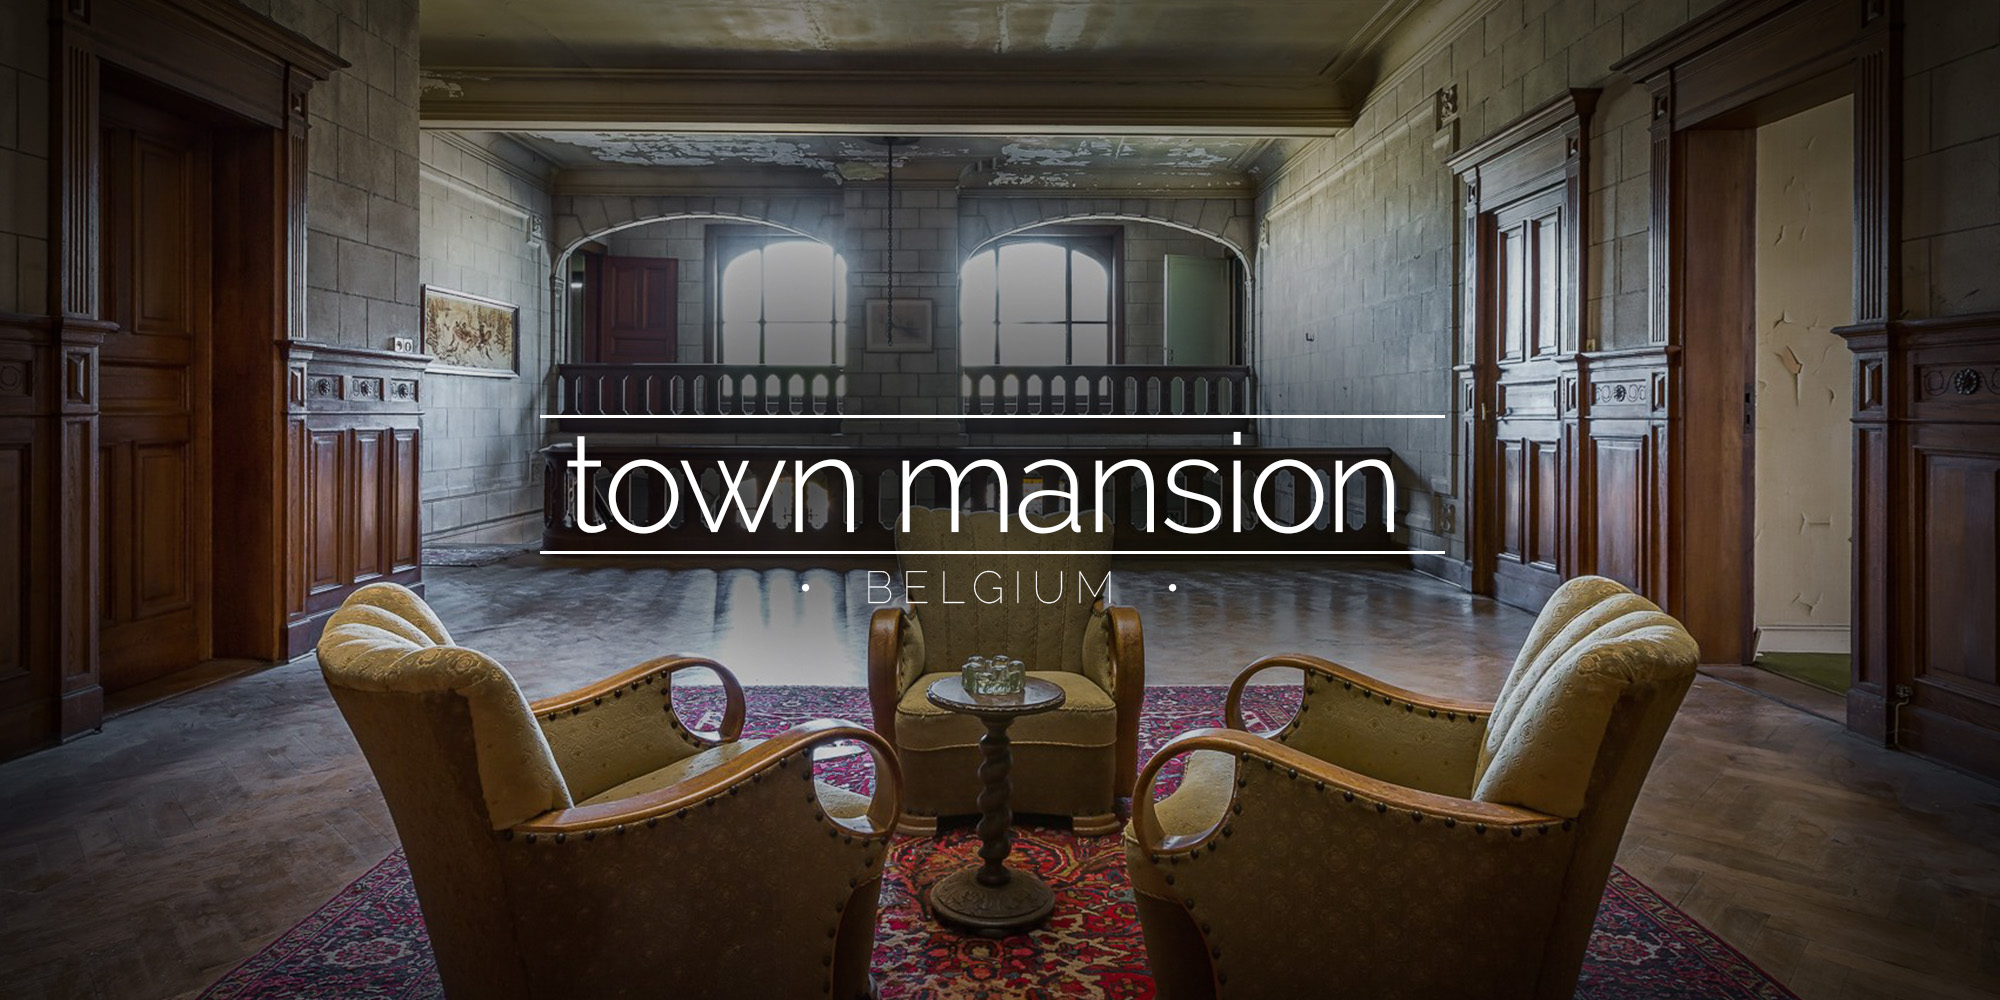 Town Mansion, Belgium